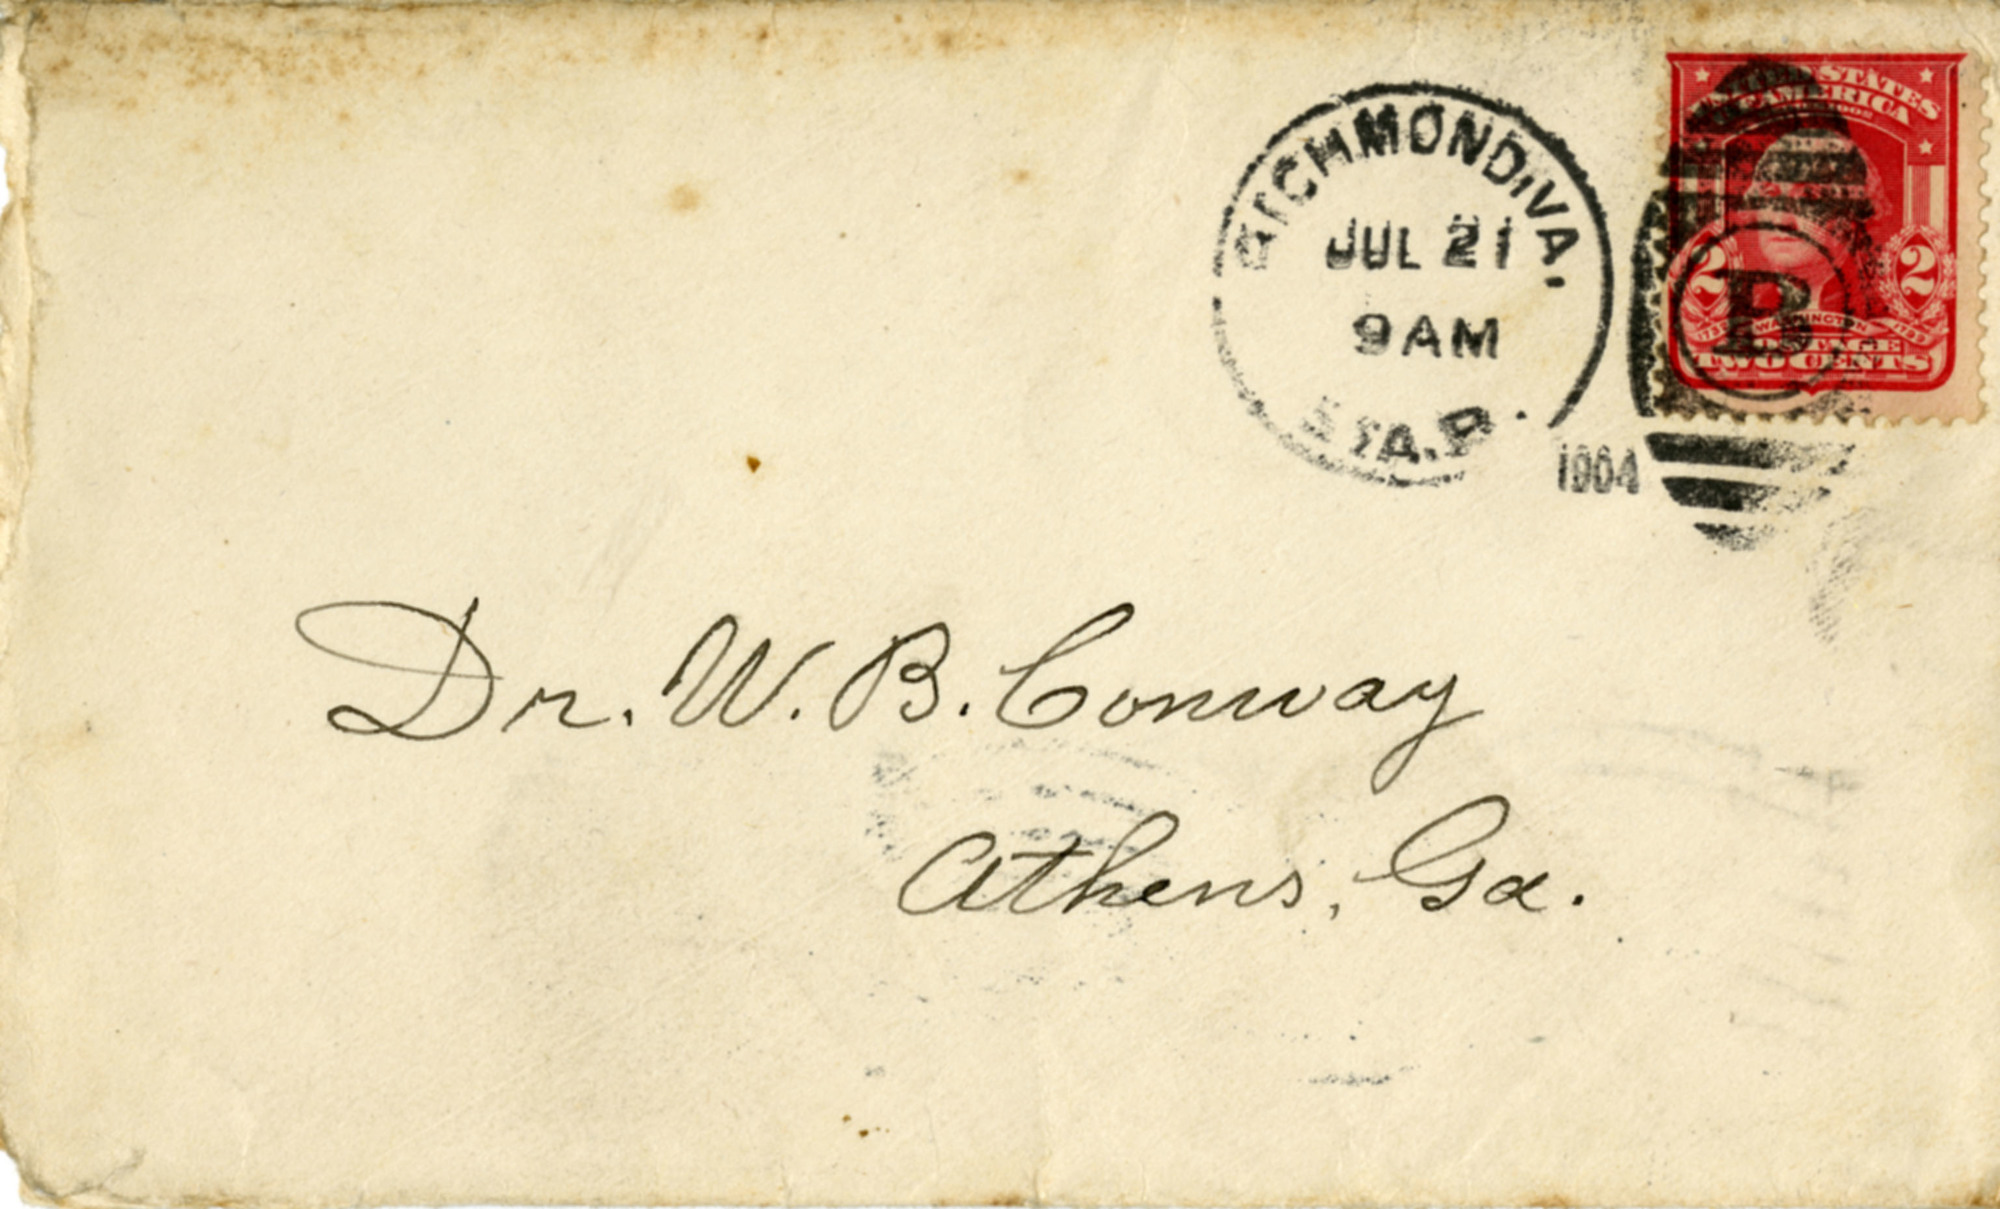 http://spec.lib.vt.edu/pickup/Omeka_upload/Ms2012-039_ConwayCatlett_F5_Letter_1904_0717_enva.jpg